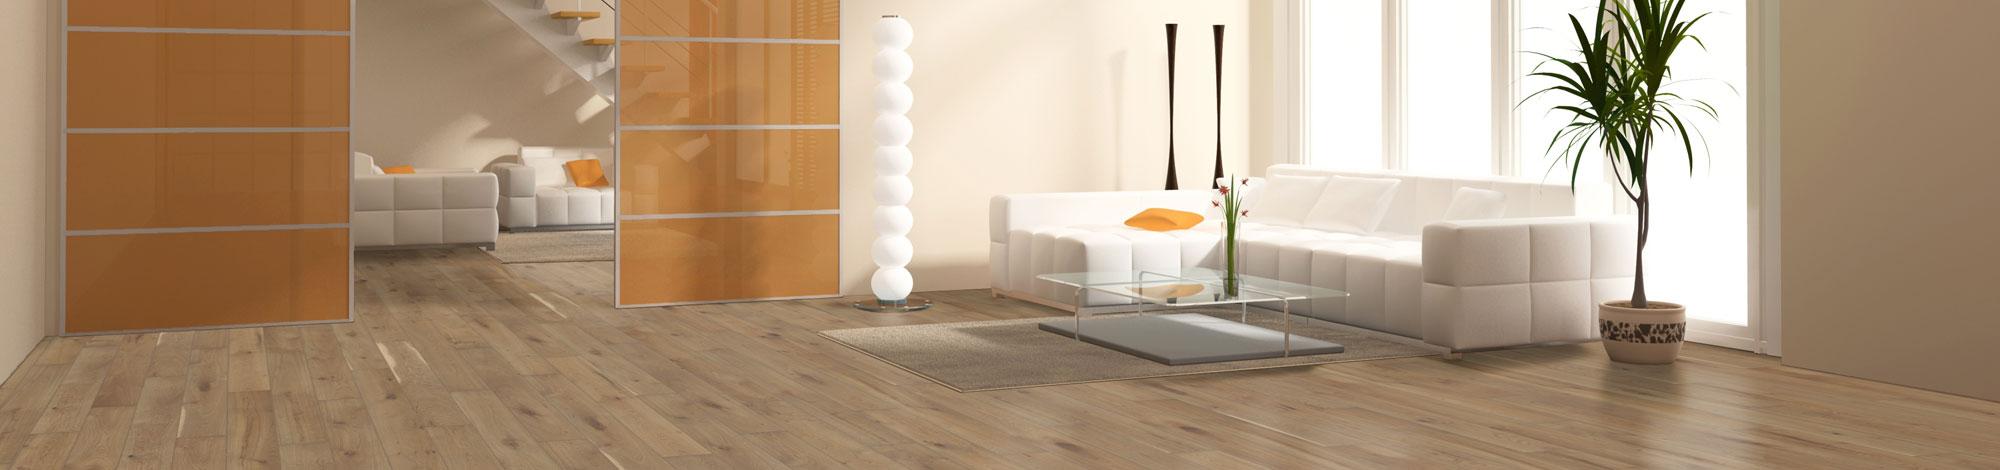 d sselparkett ihr parkett f r d sseldorf bodenbelag koch gmbh co kg parkett laminat. Black Bedroom Furniture Sets. Home Design Ideas